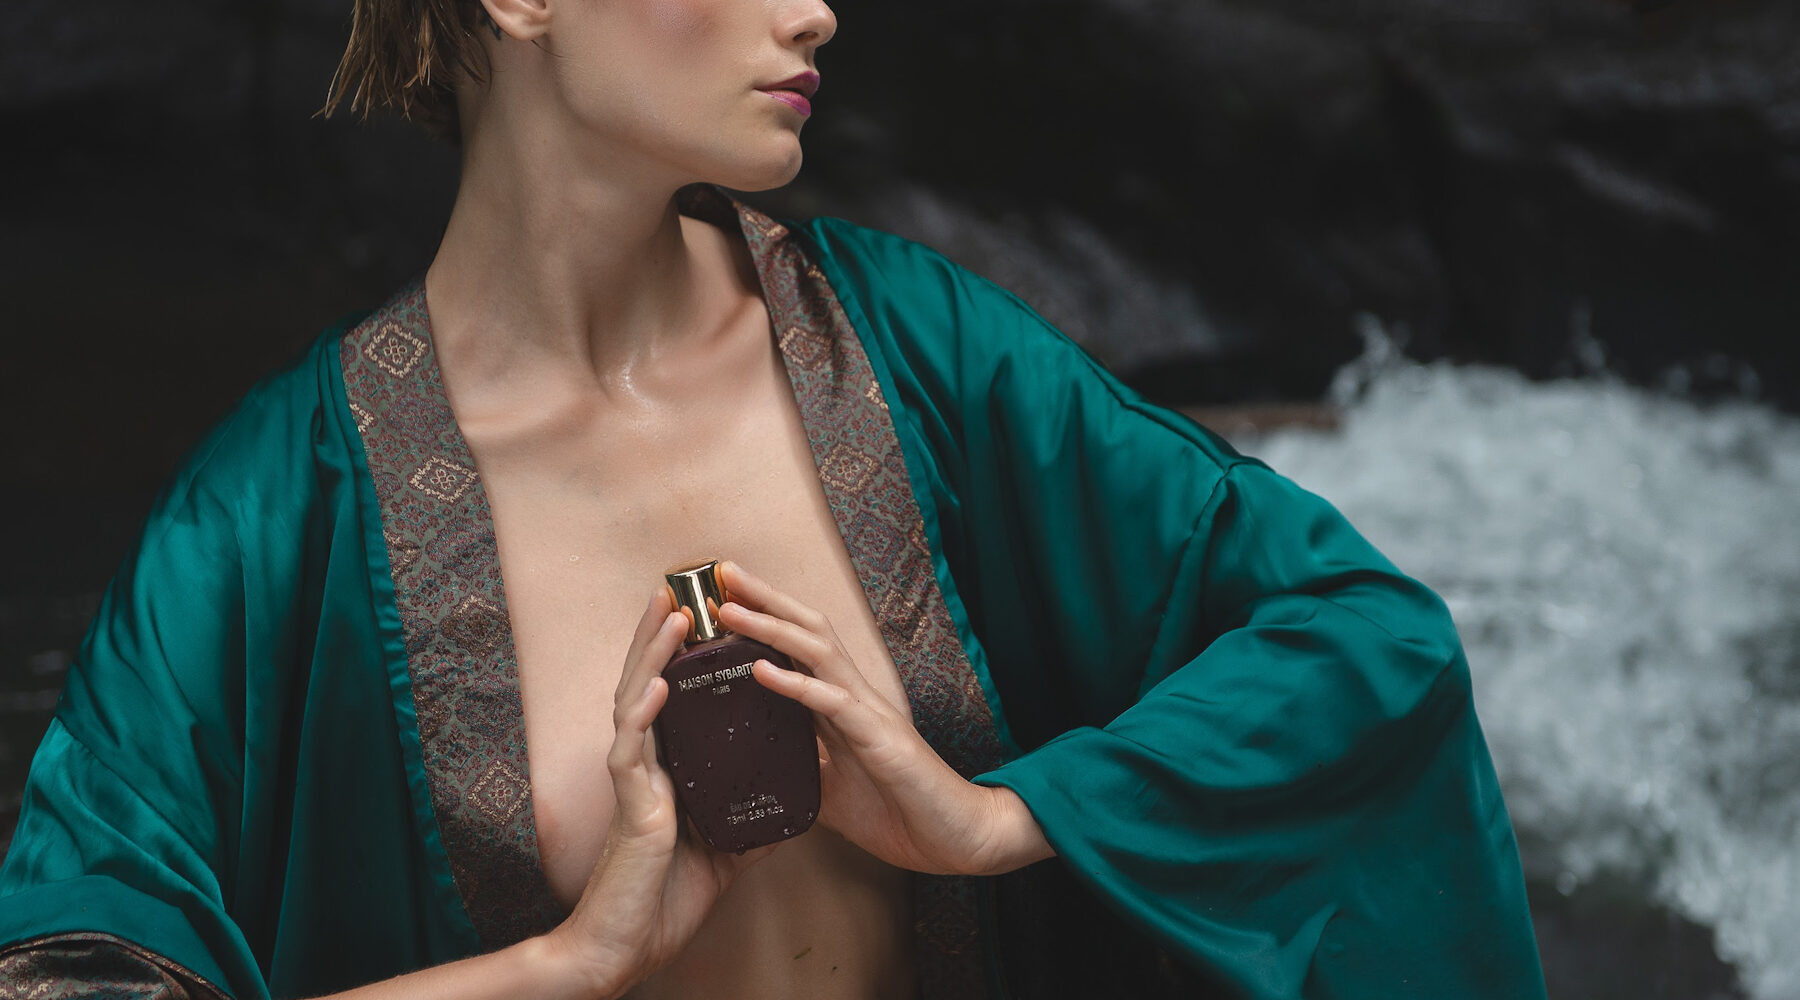 Maison Sybarite Transforms Fine Fragrances By Avoiding Alcohol